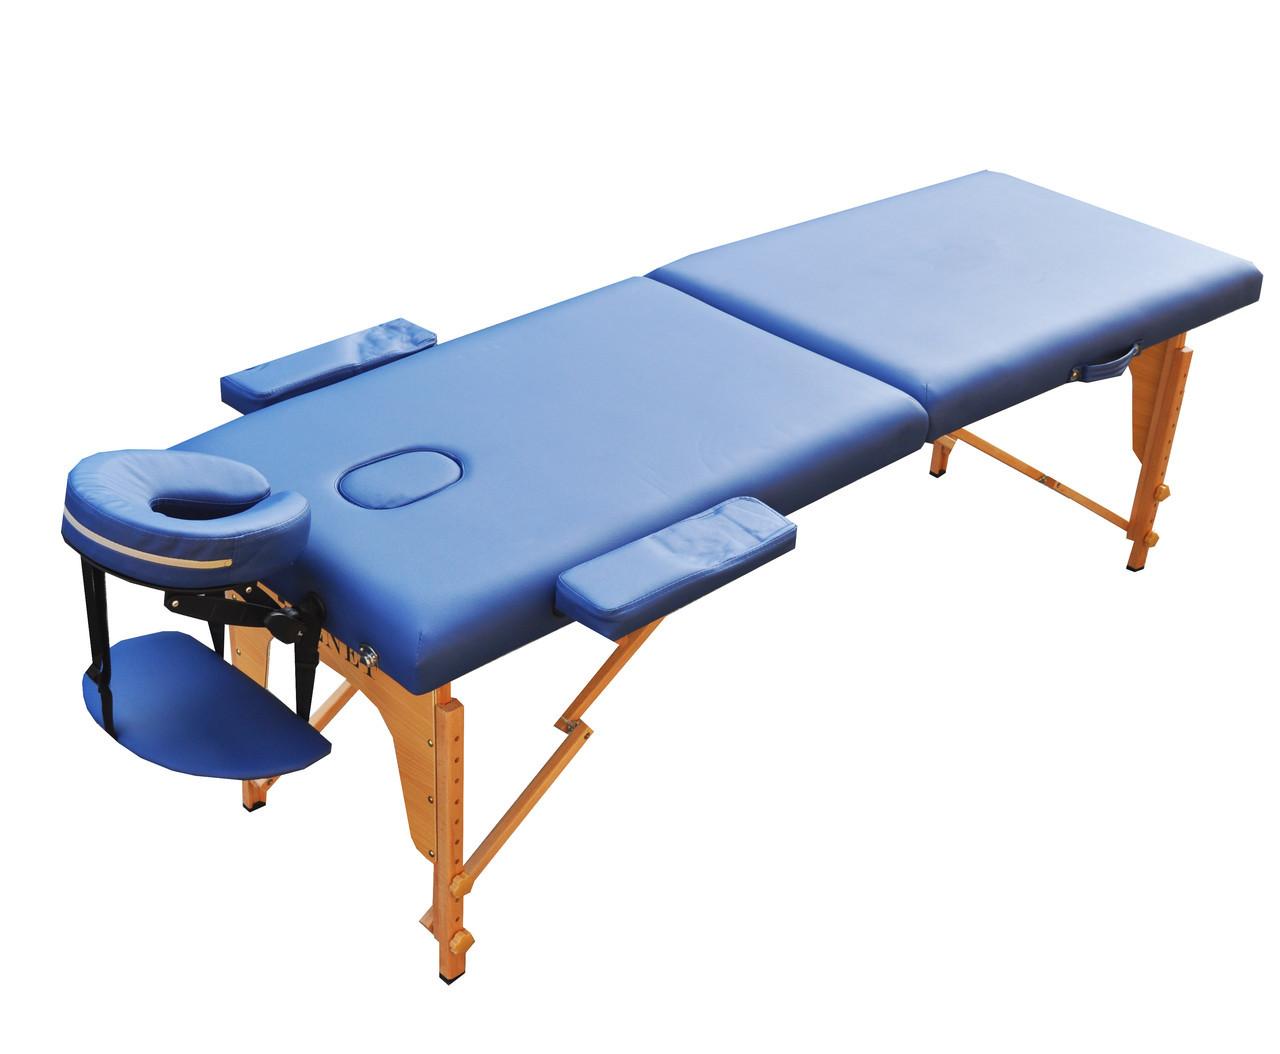 Массажный стол  ZENET  ZET-1042  размер  M (185*70*61) NAVY BLUE